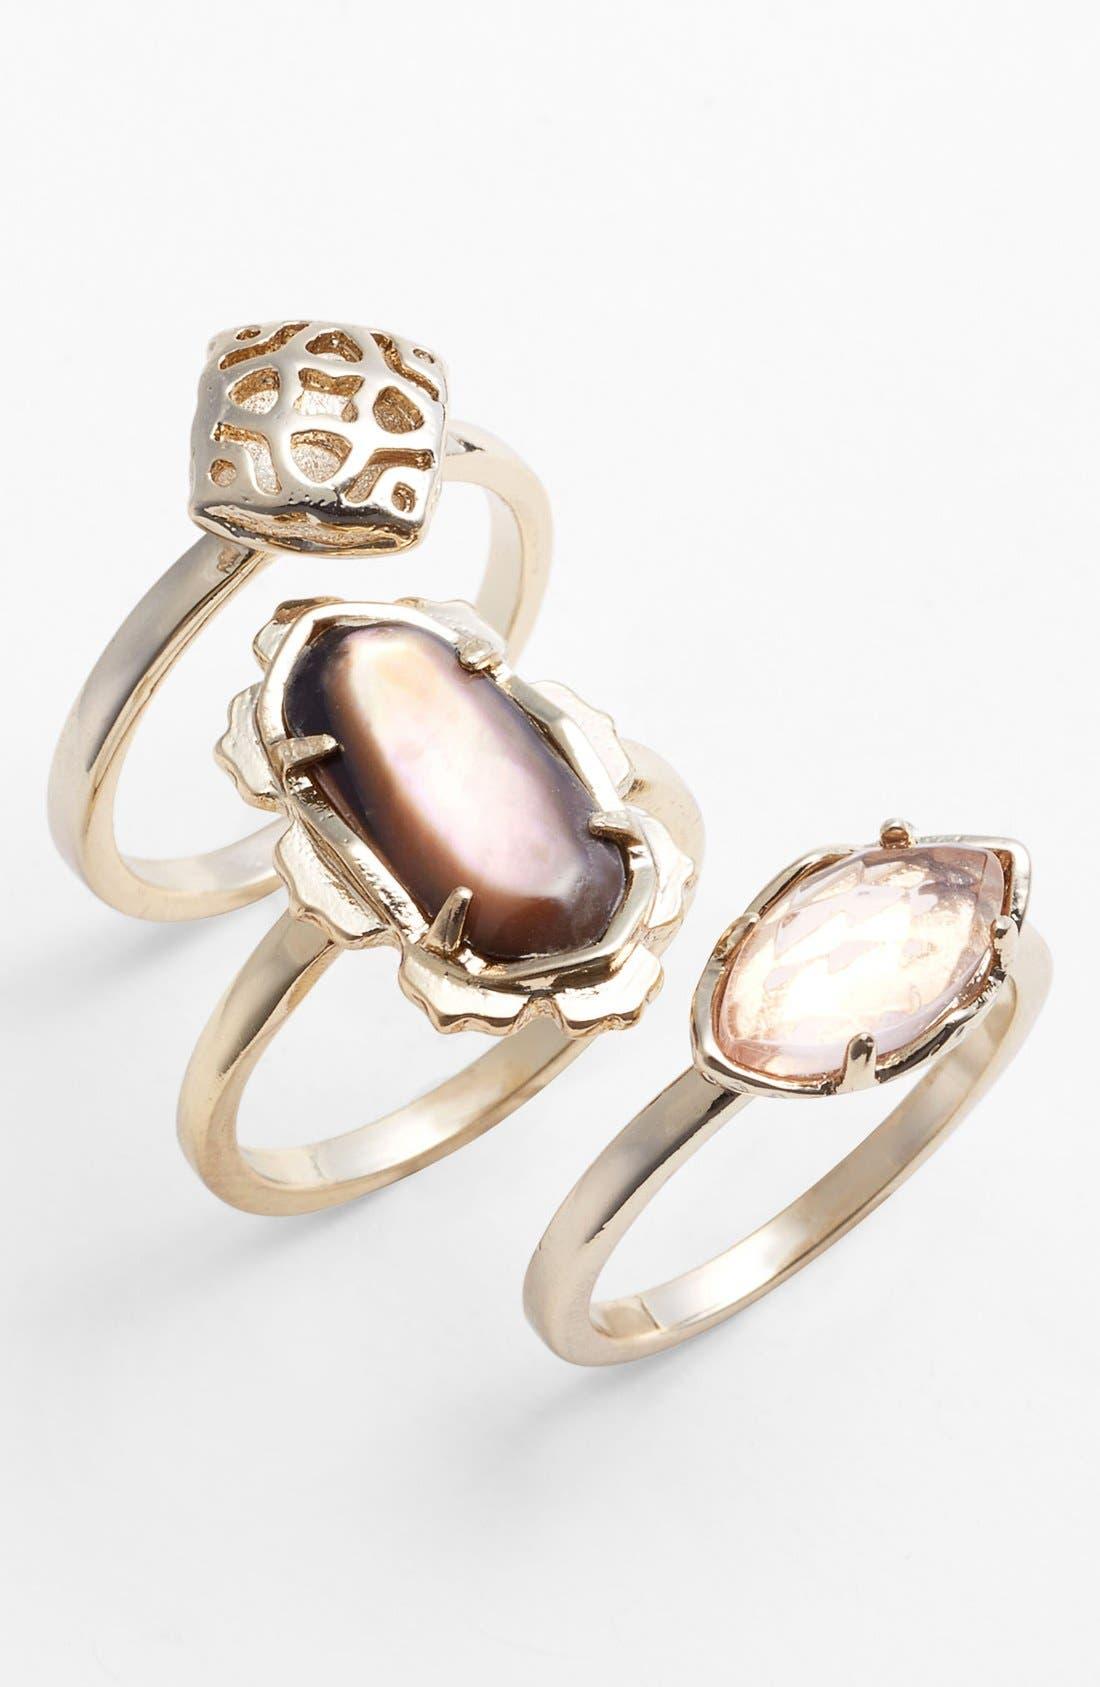 Alternate Image 1 Selected - Kendra Scott 'Isha' Mixed Stone Rings (Set of 3)